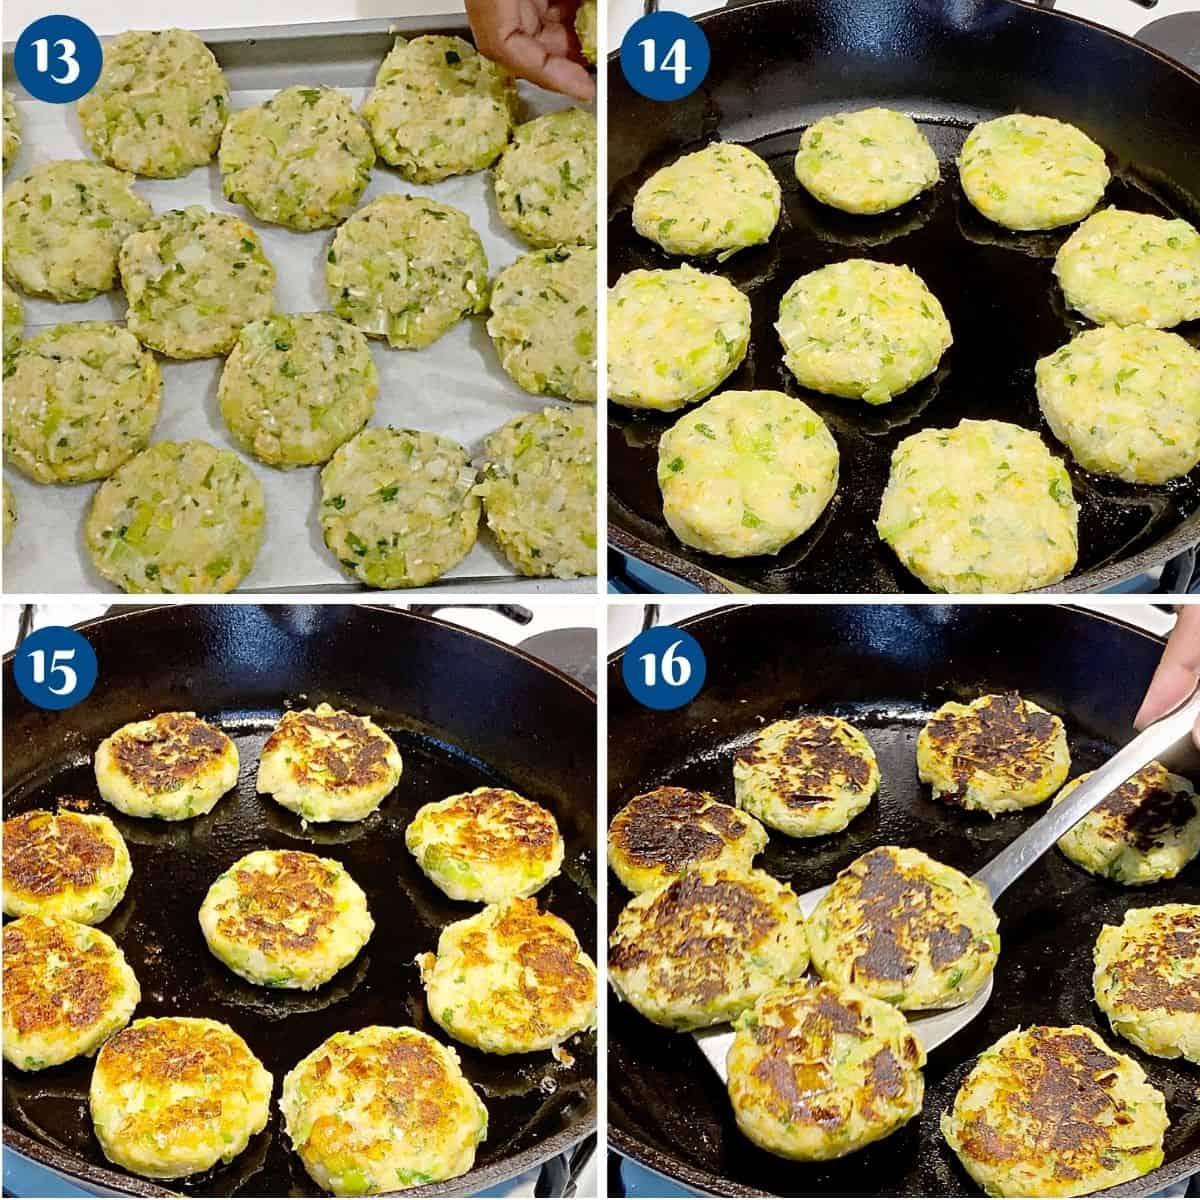 Progress pictures collage pan frying the leek potato patties.